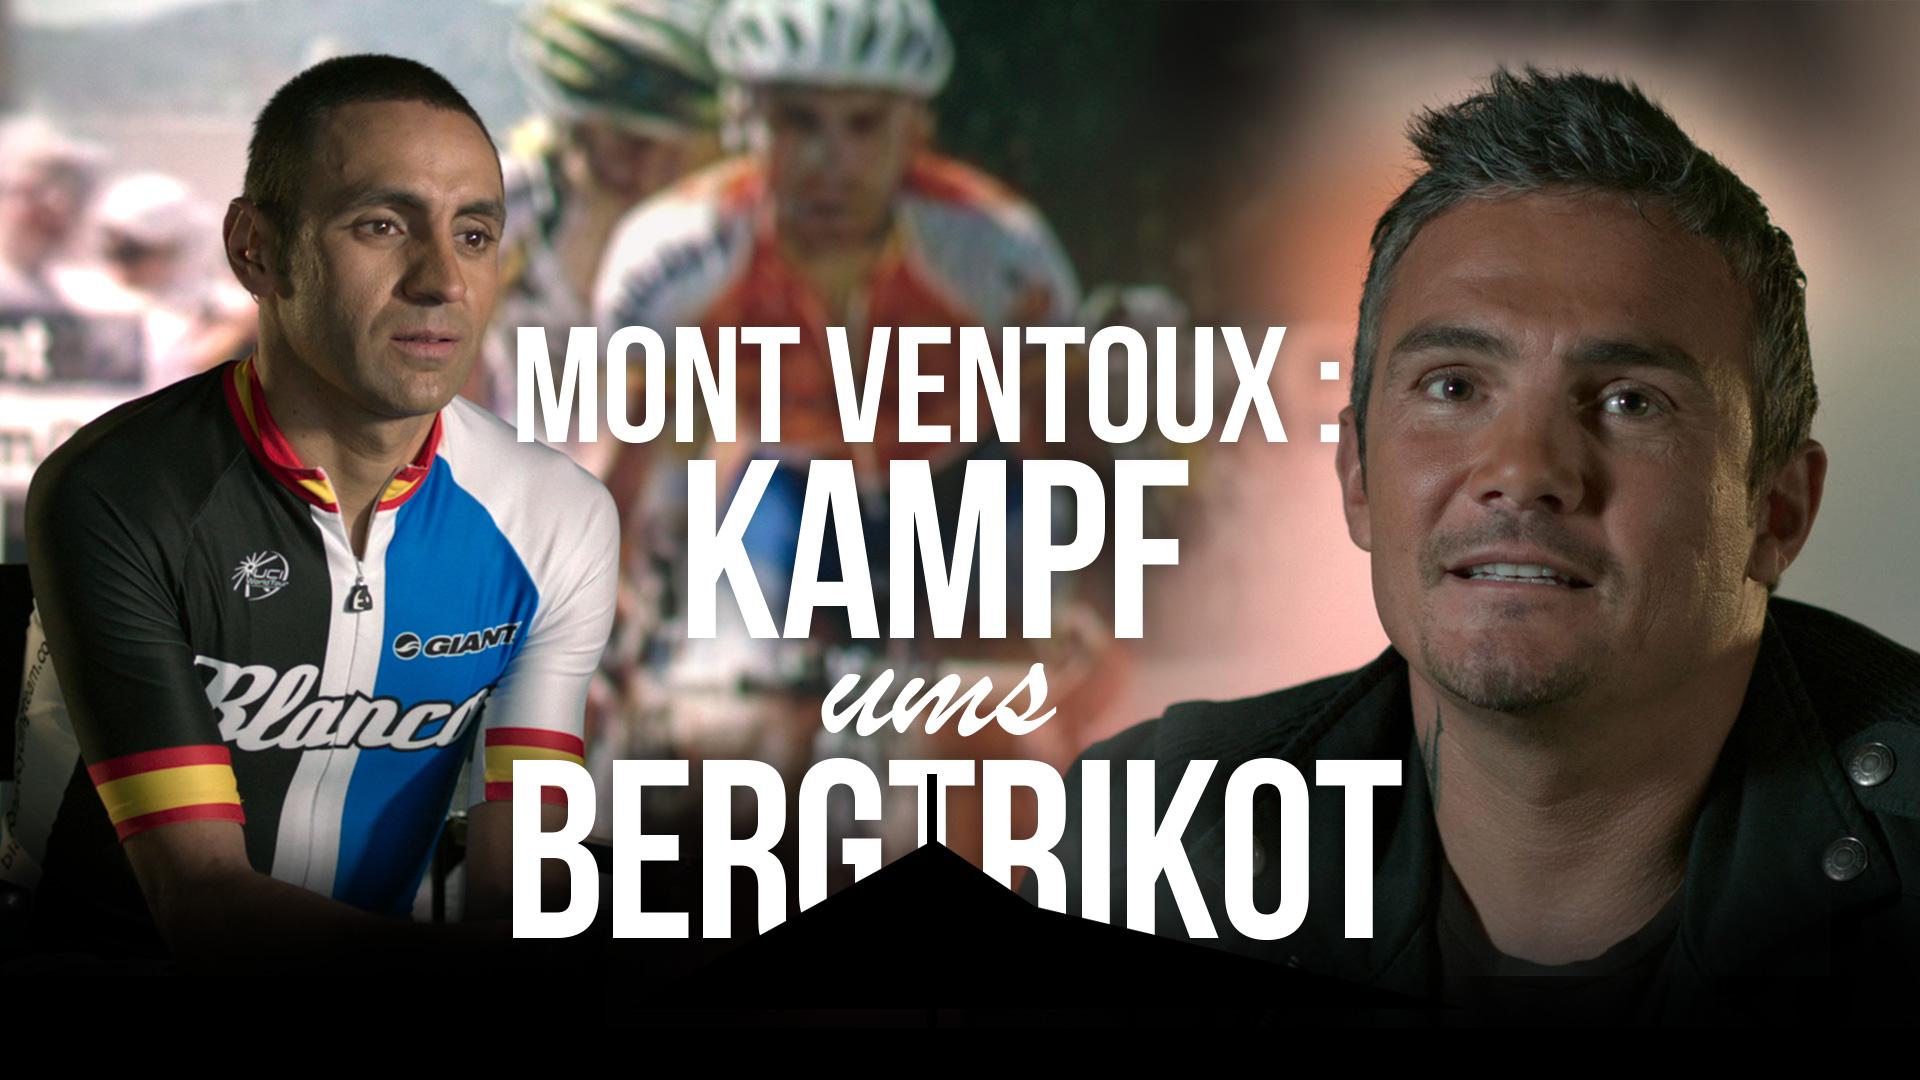 Mont Ventoux: Kampf ums Bergtrikot